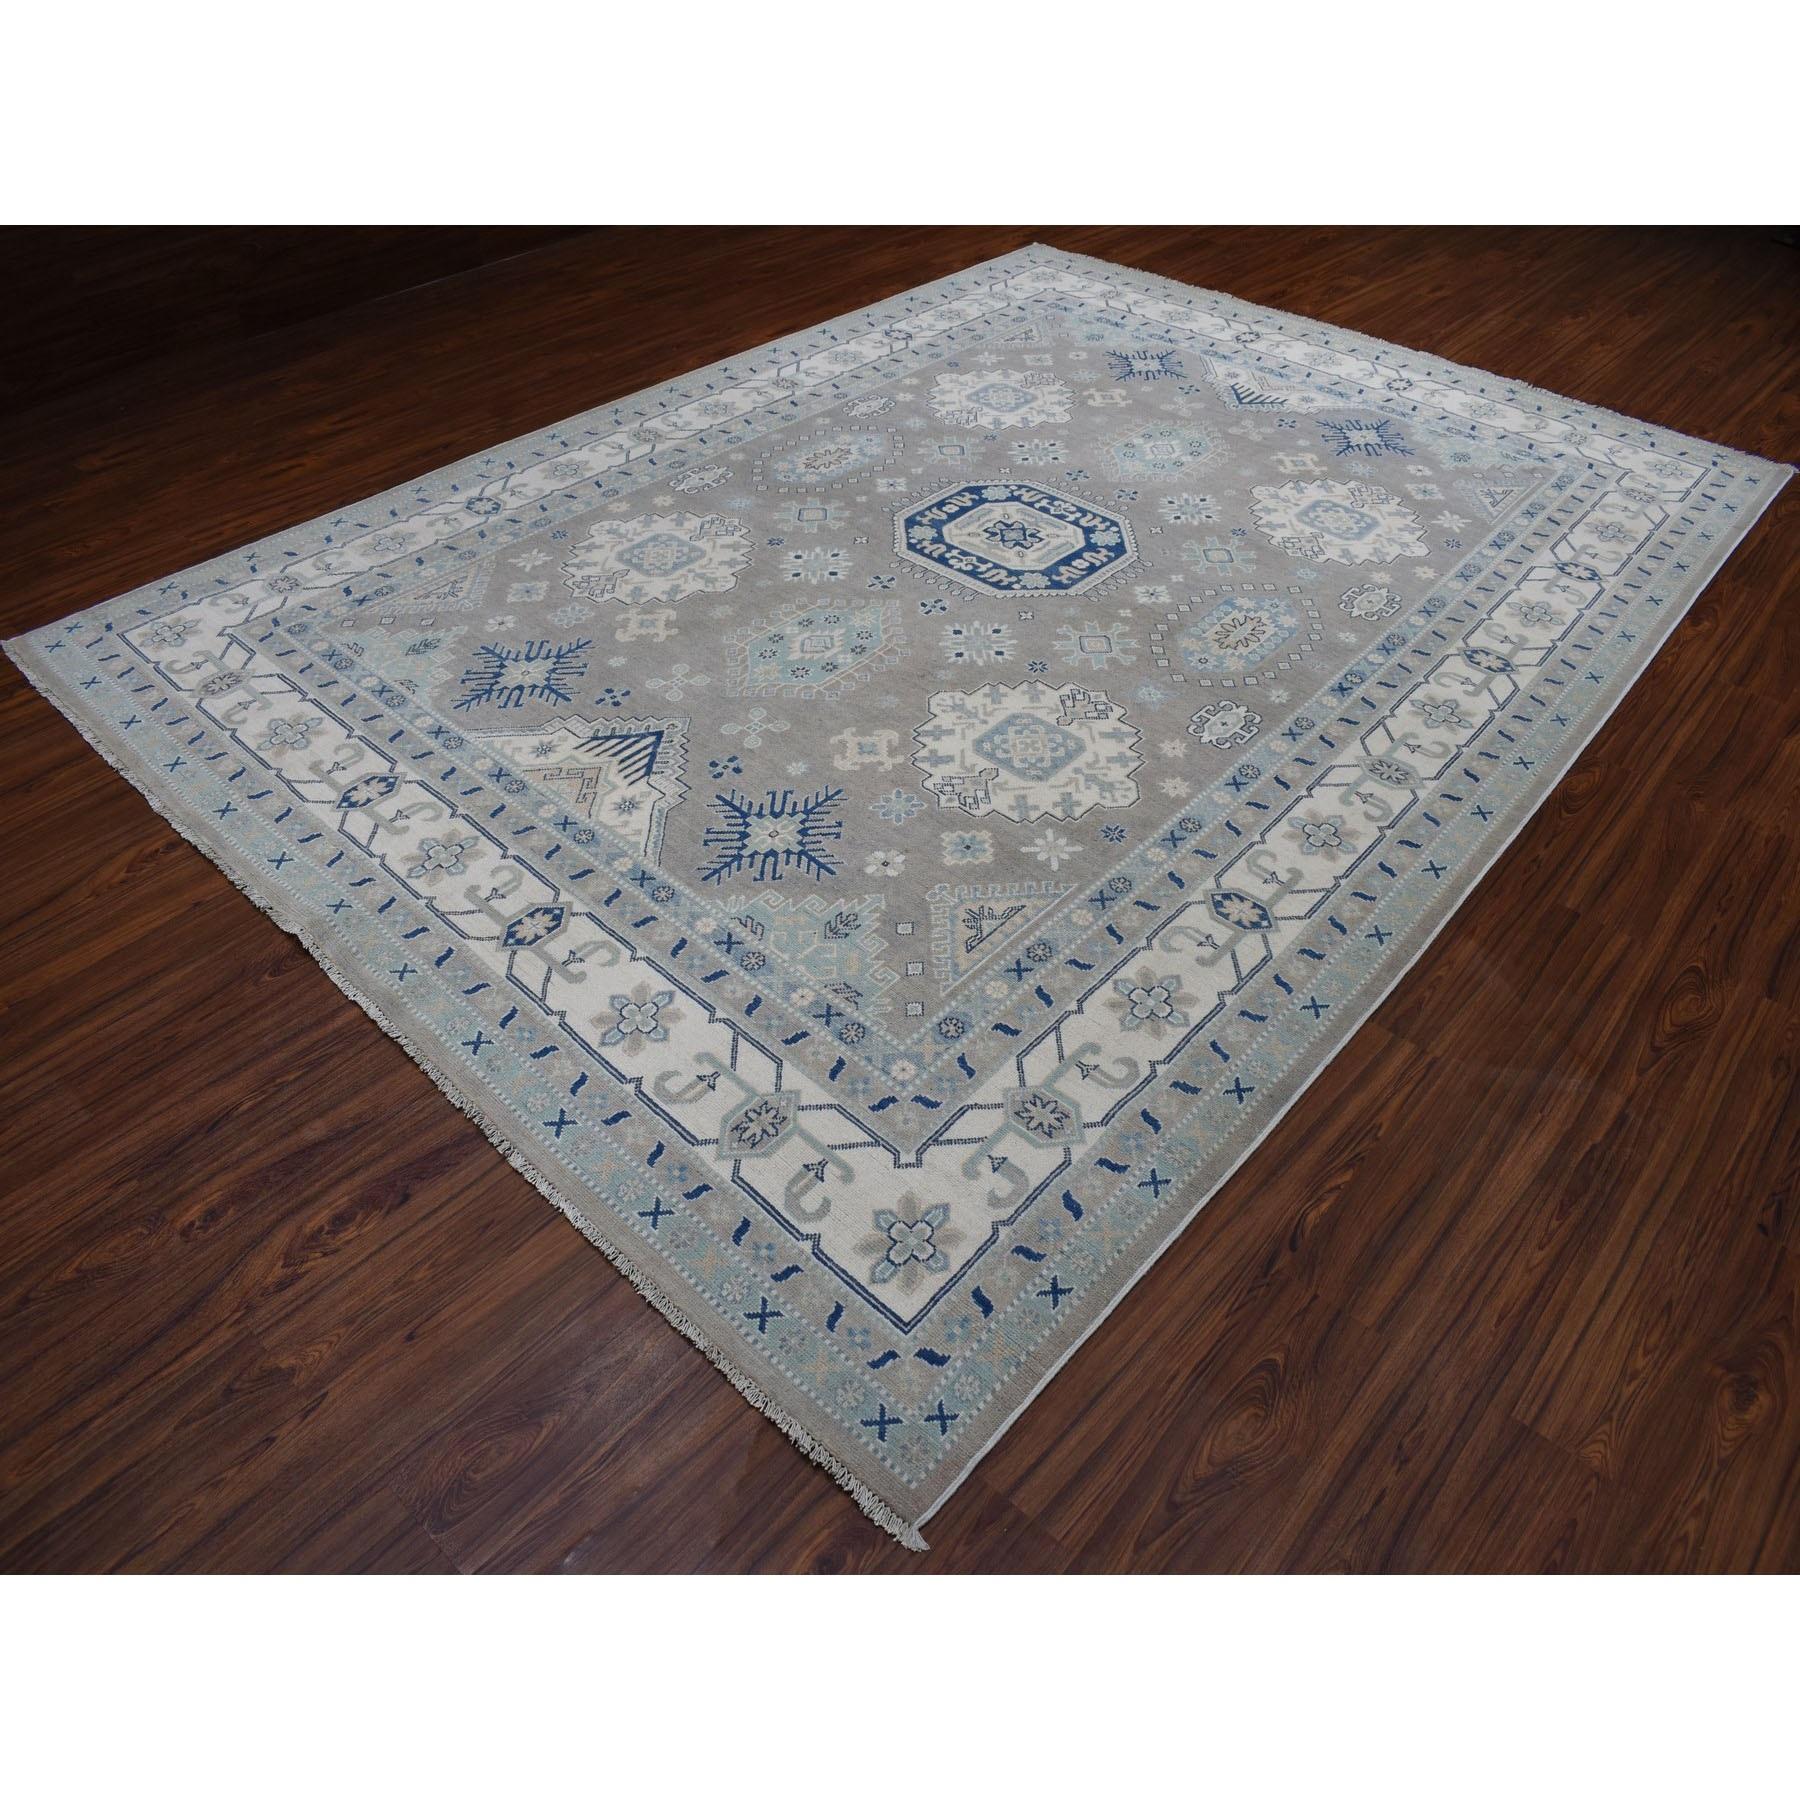 "8'9""x12' Gray Vintage Look Kazak Geometric Design Pure Wool Hand Knotted Oriental Rug"